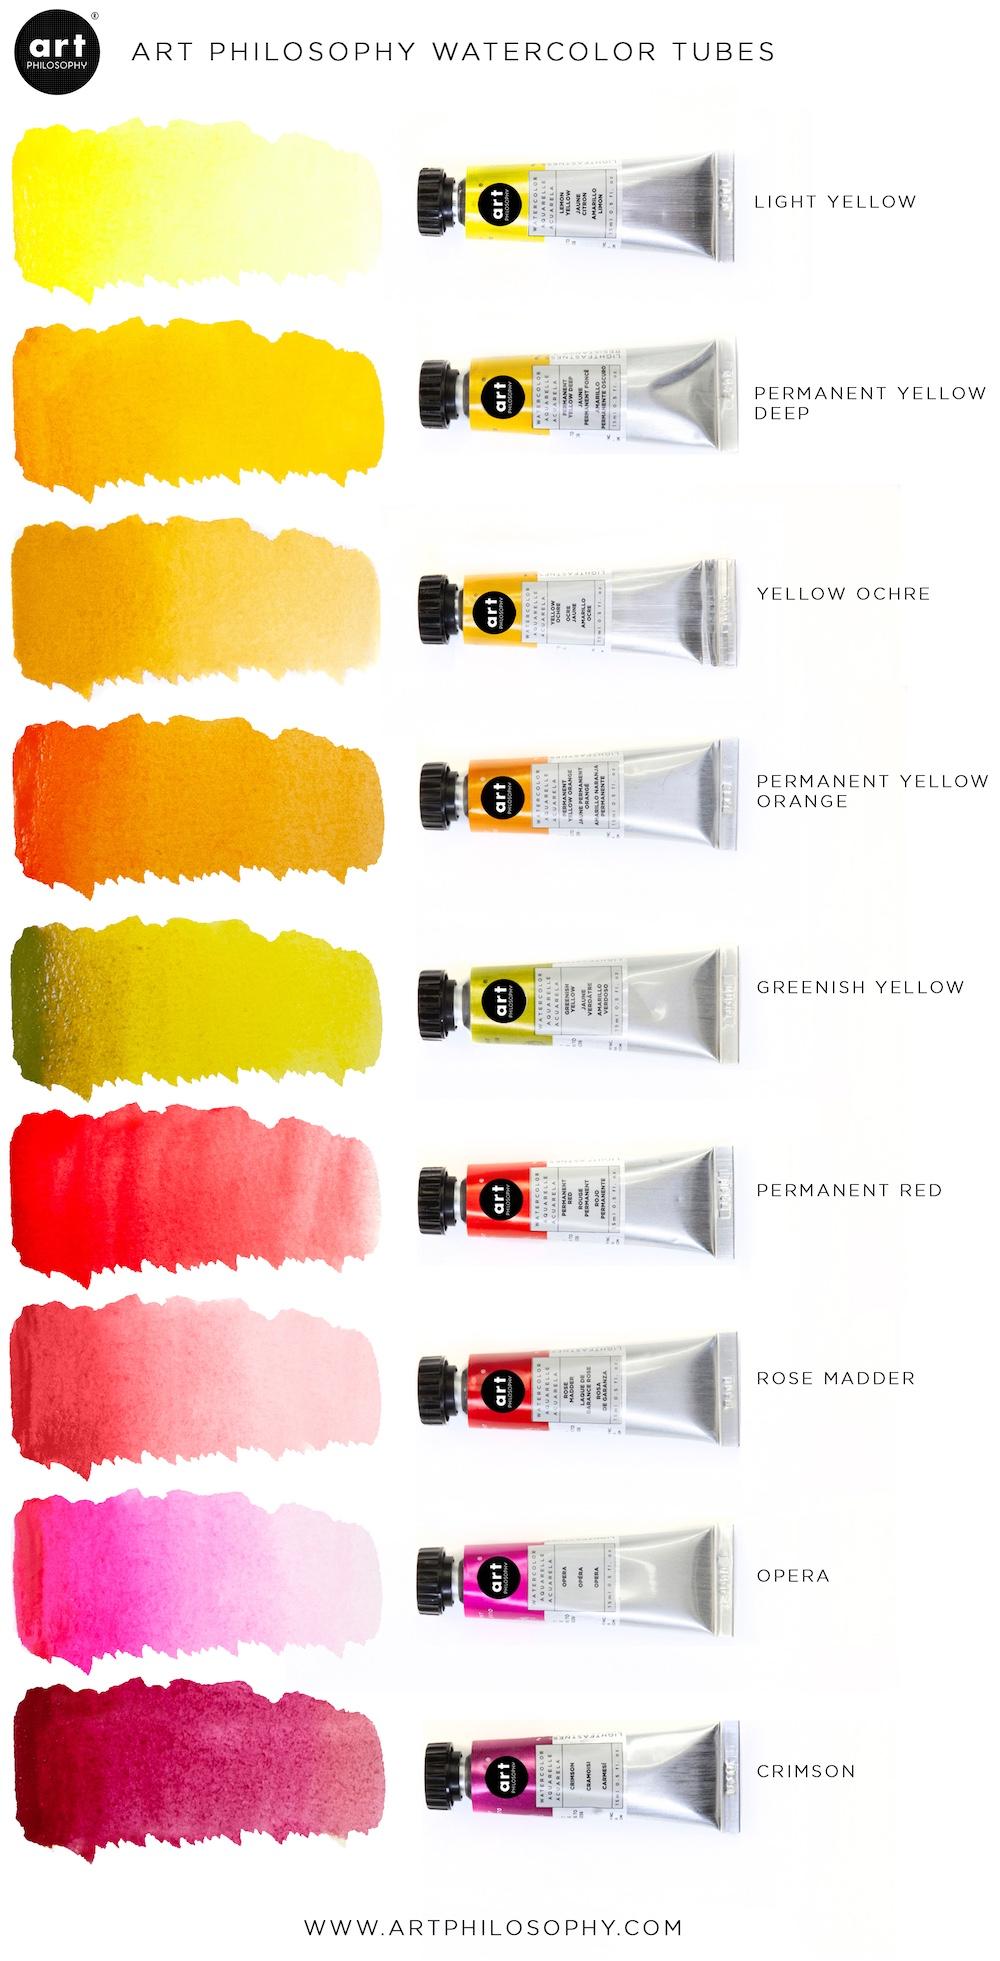 Art Philosophy® Artist Grade Watercolor Tubes - Permanent Yellow Deep